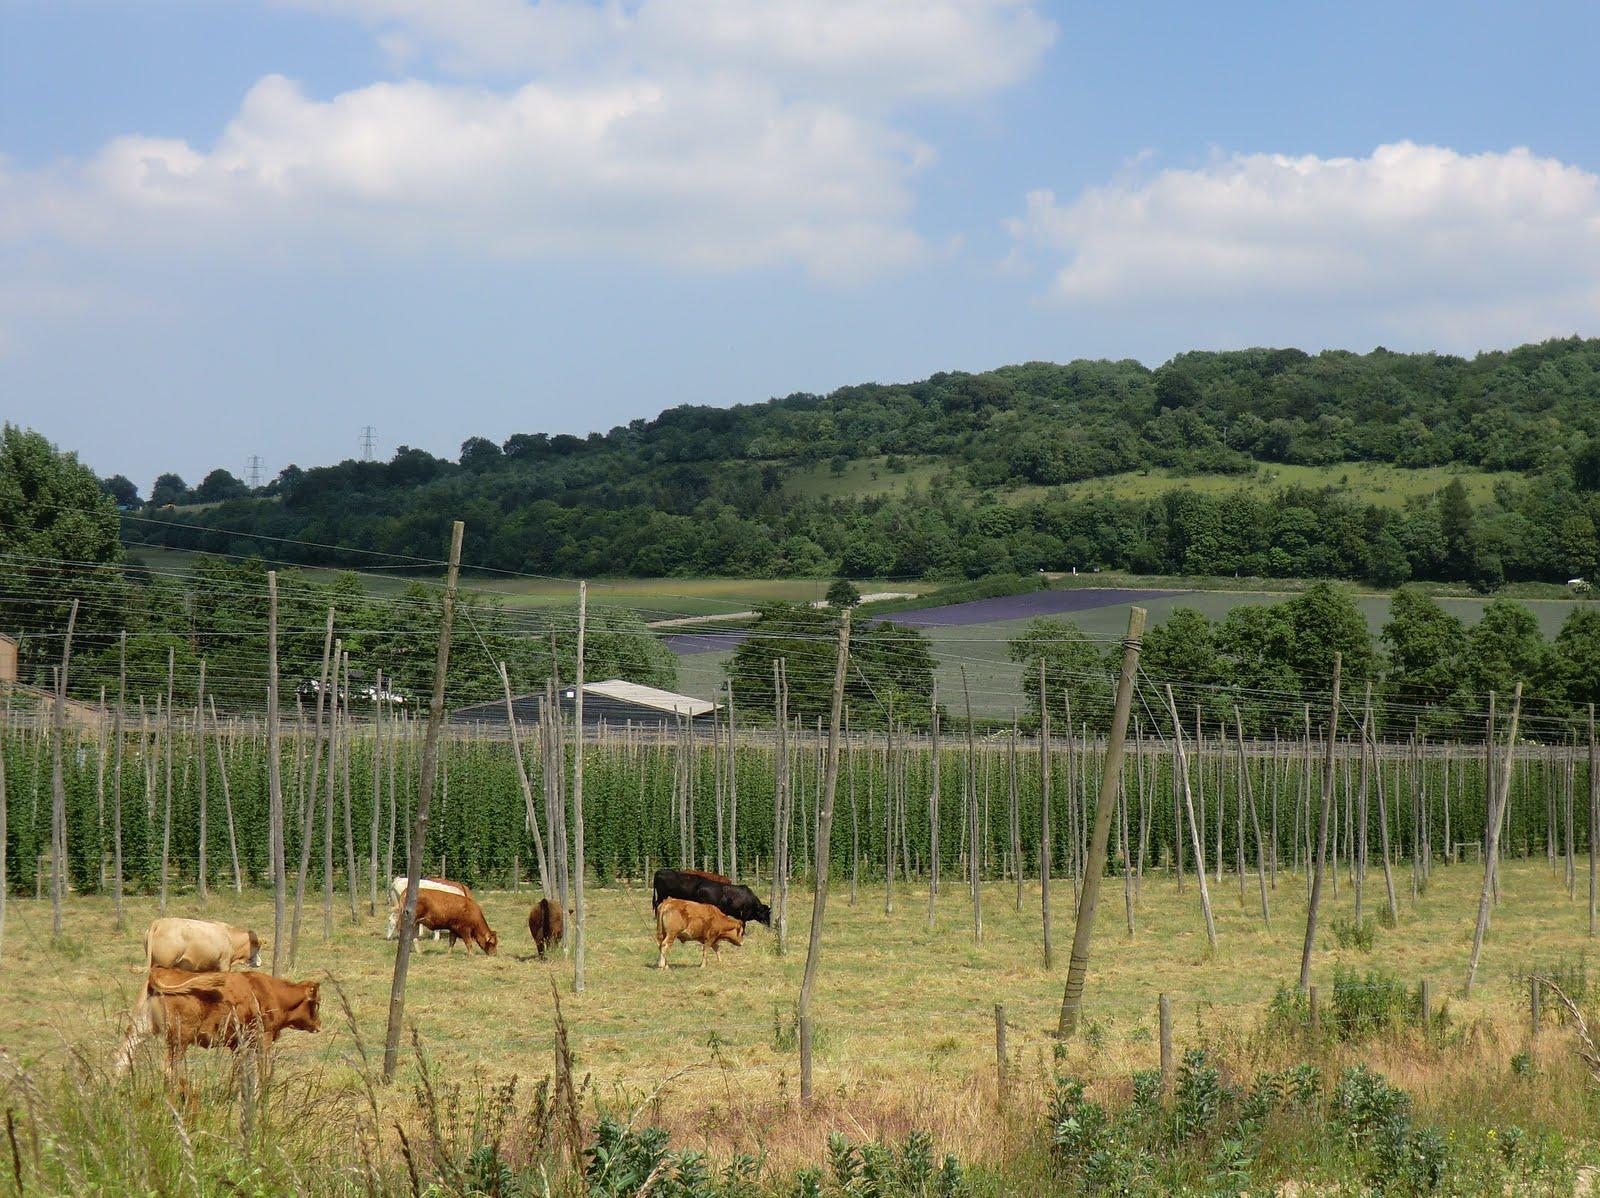 CIMG7496 Cattle, hops and lavender at Castle Farm